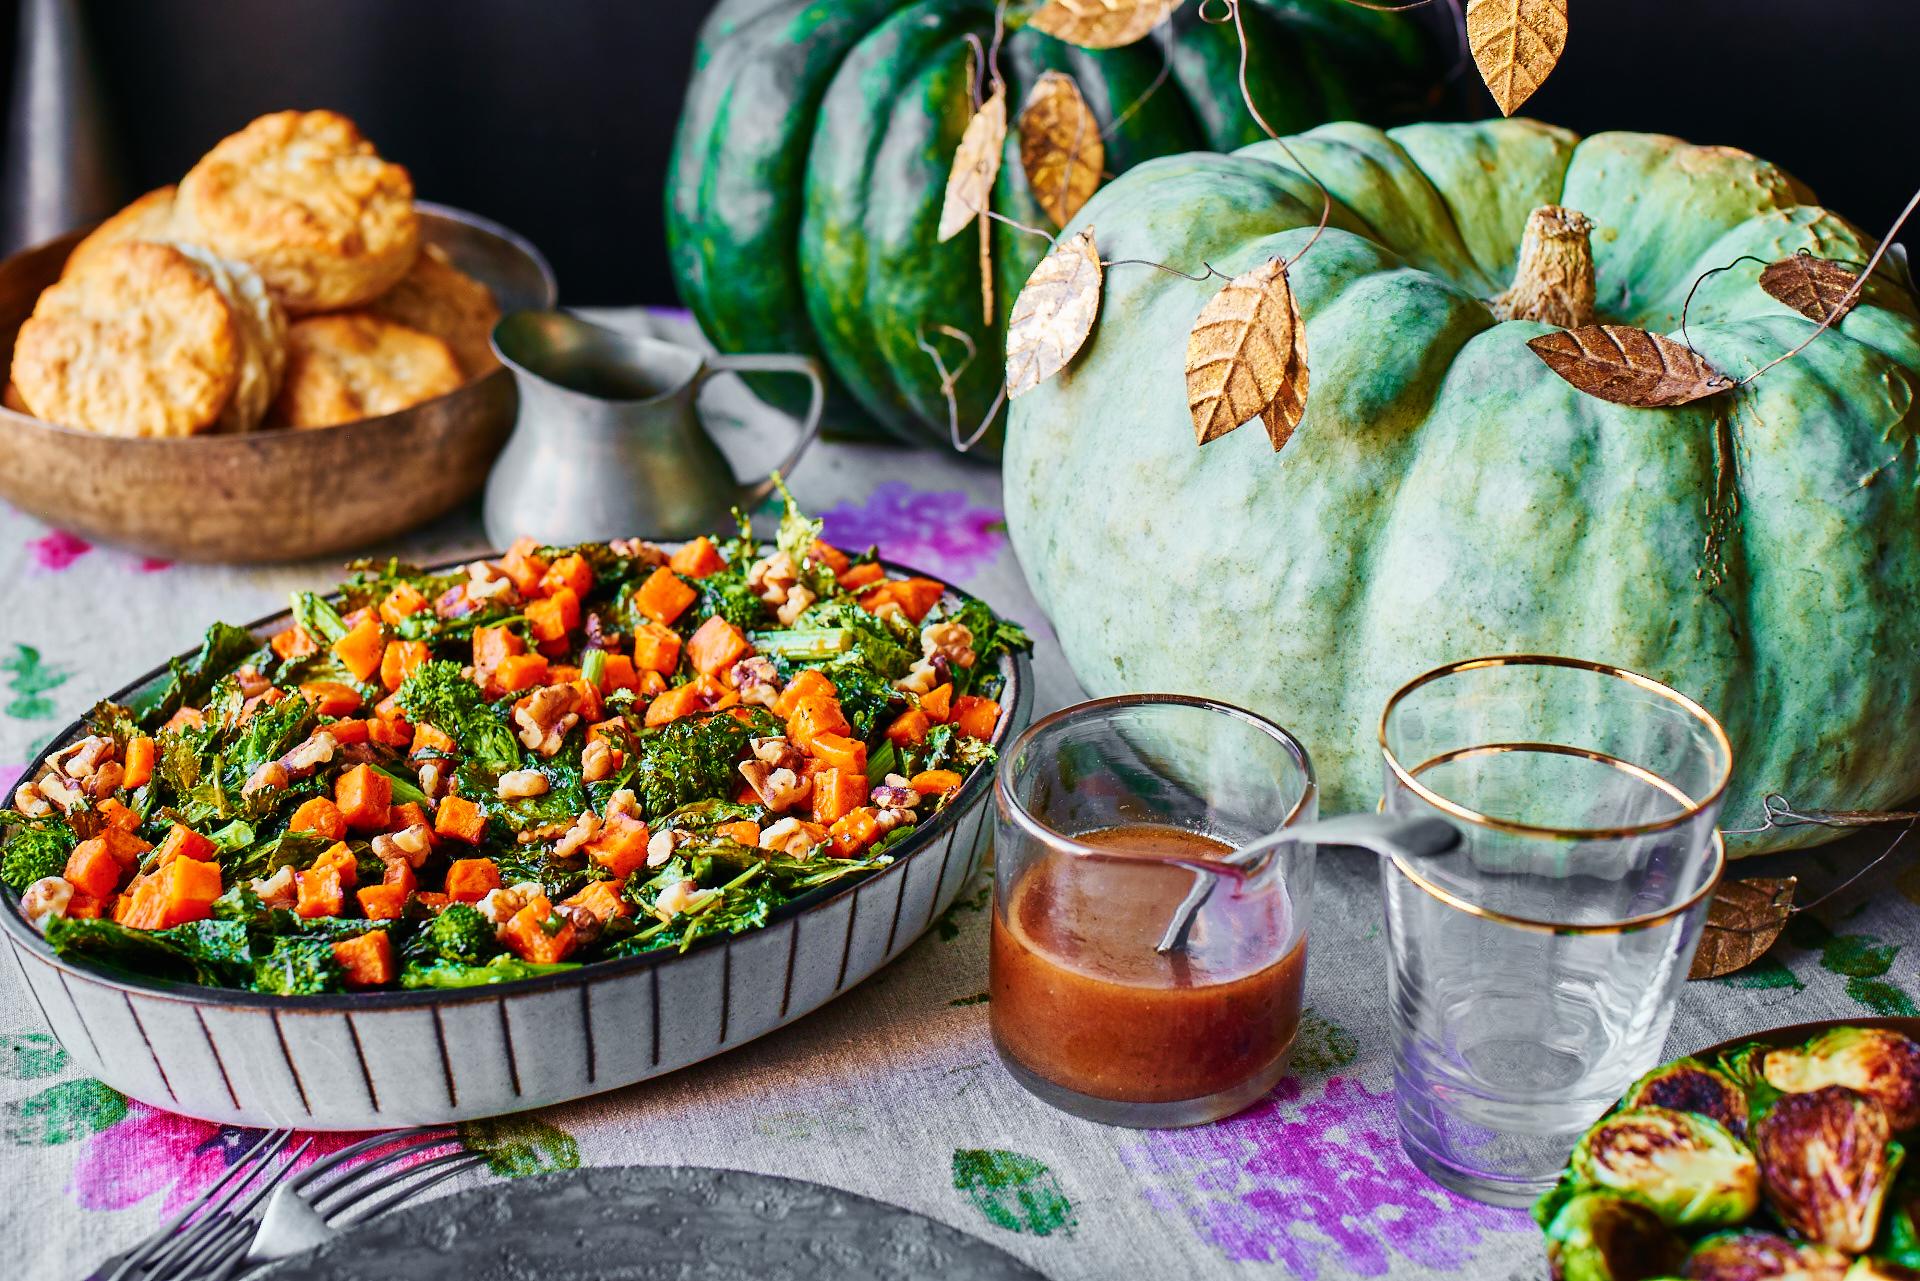 Roasted Sweet Potato and Broccoli Rabe Salad